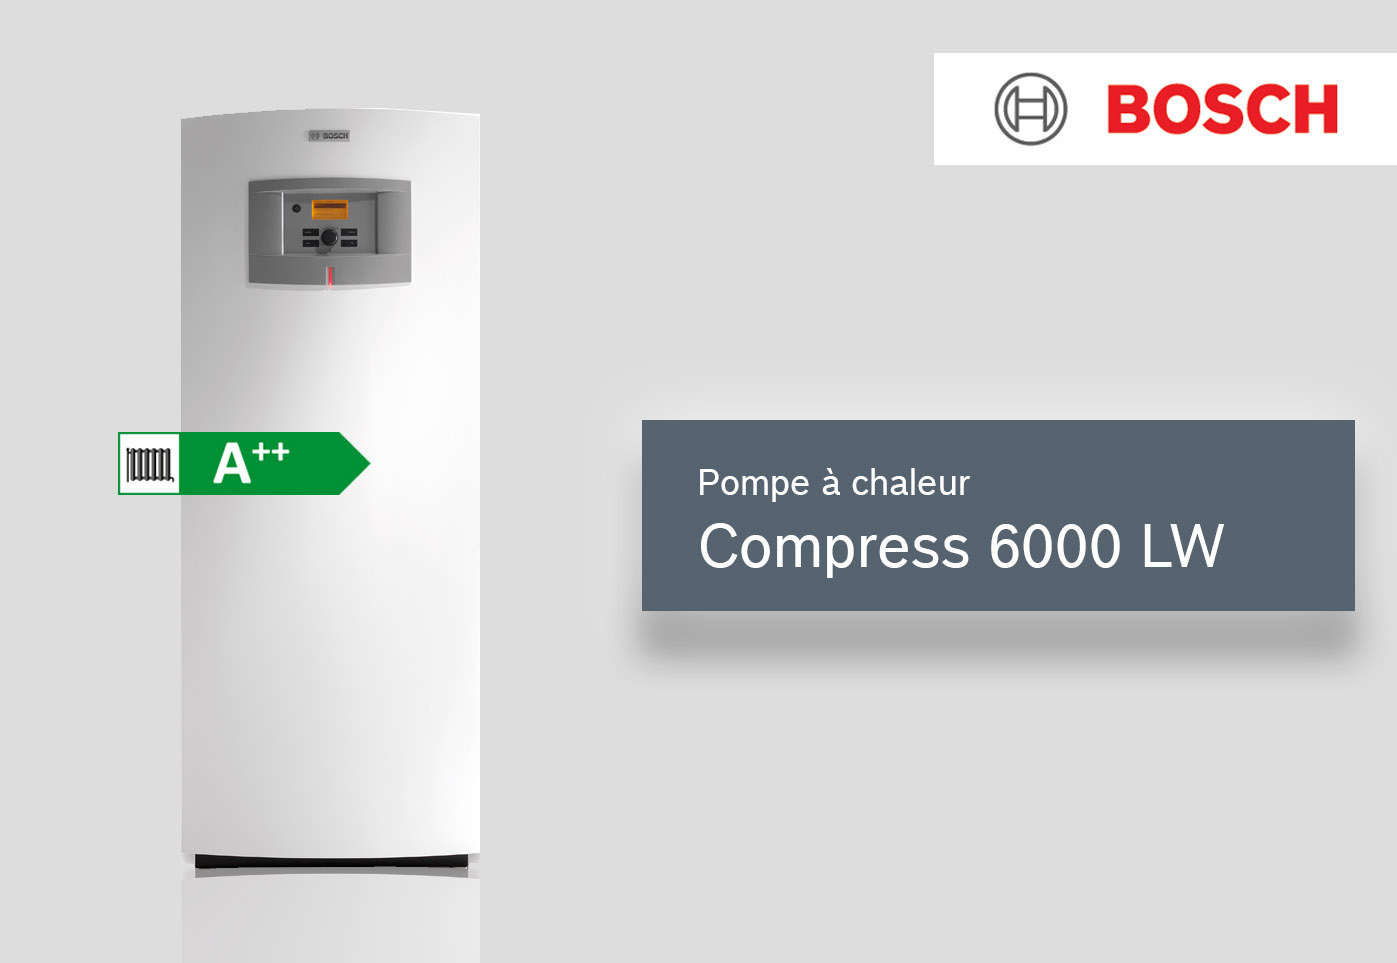 COMPRESS 6000 LW